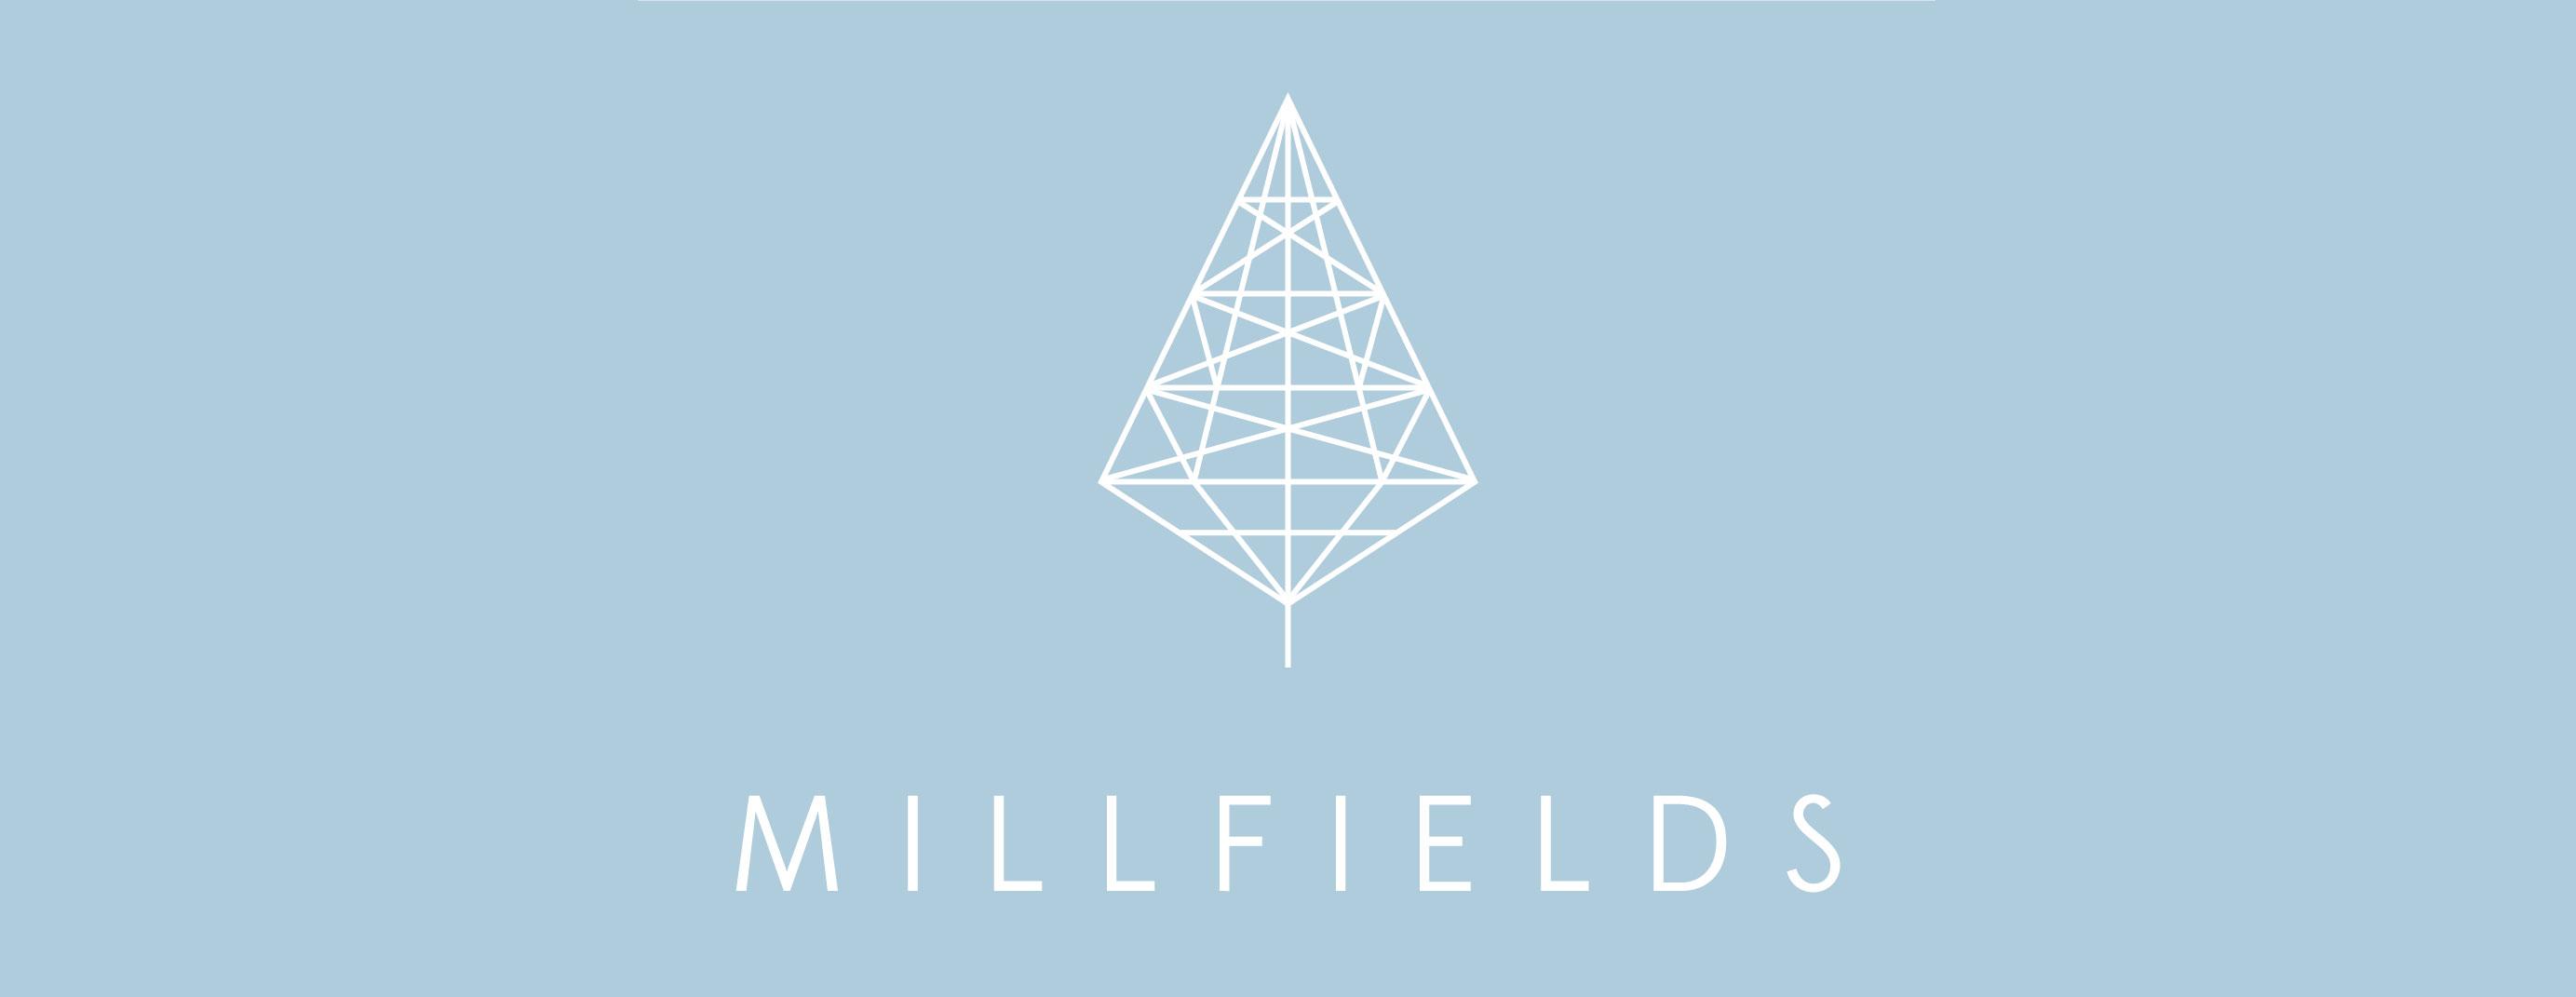 Millfields_logo_phase 2